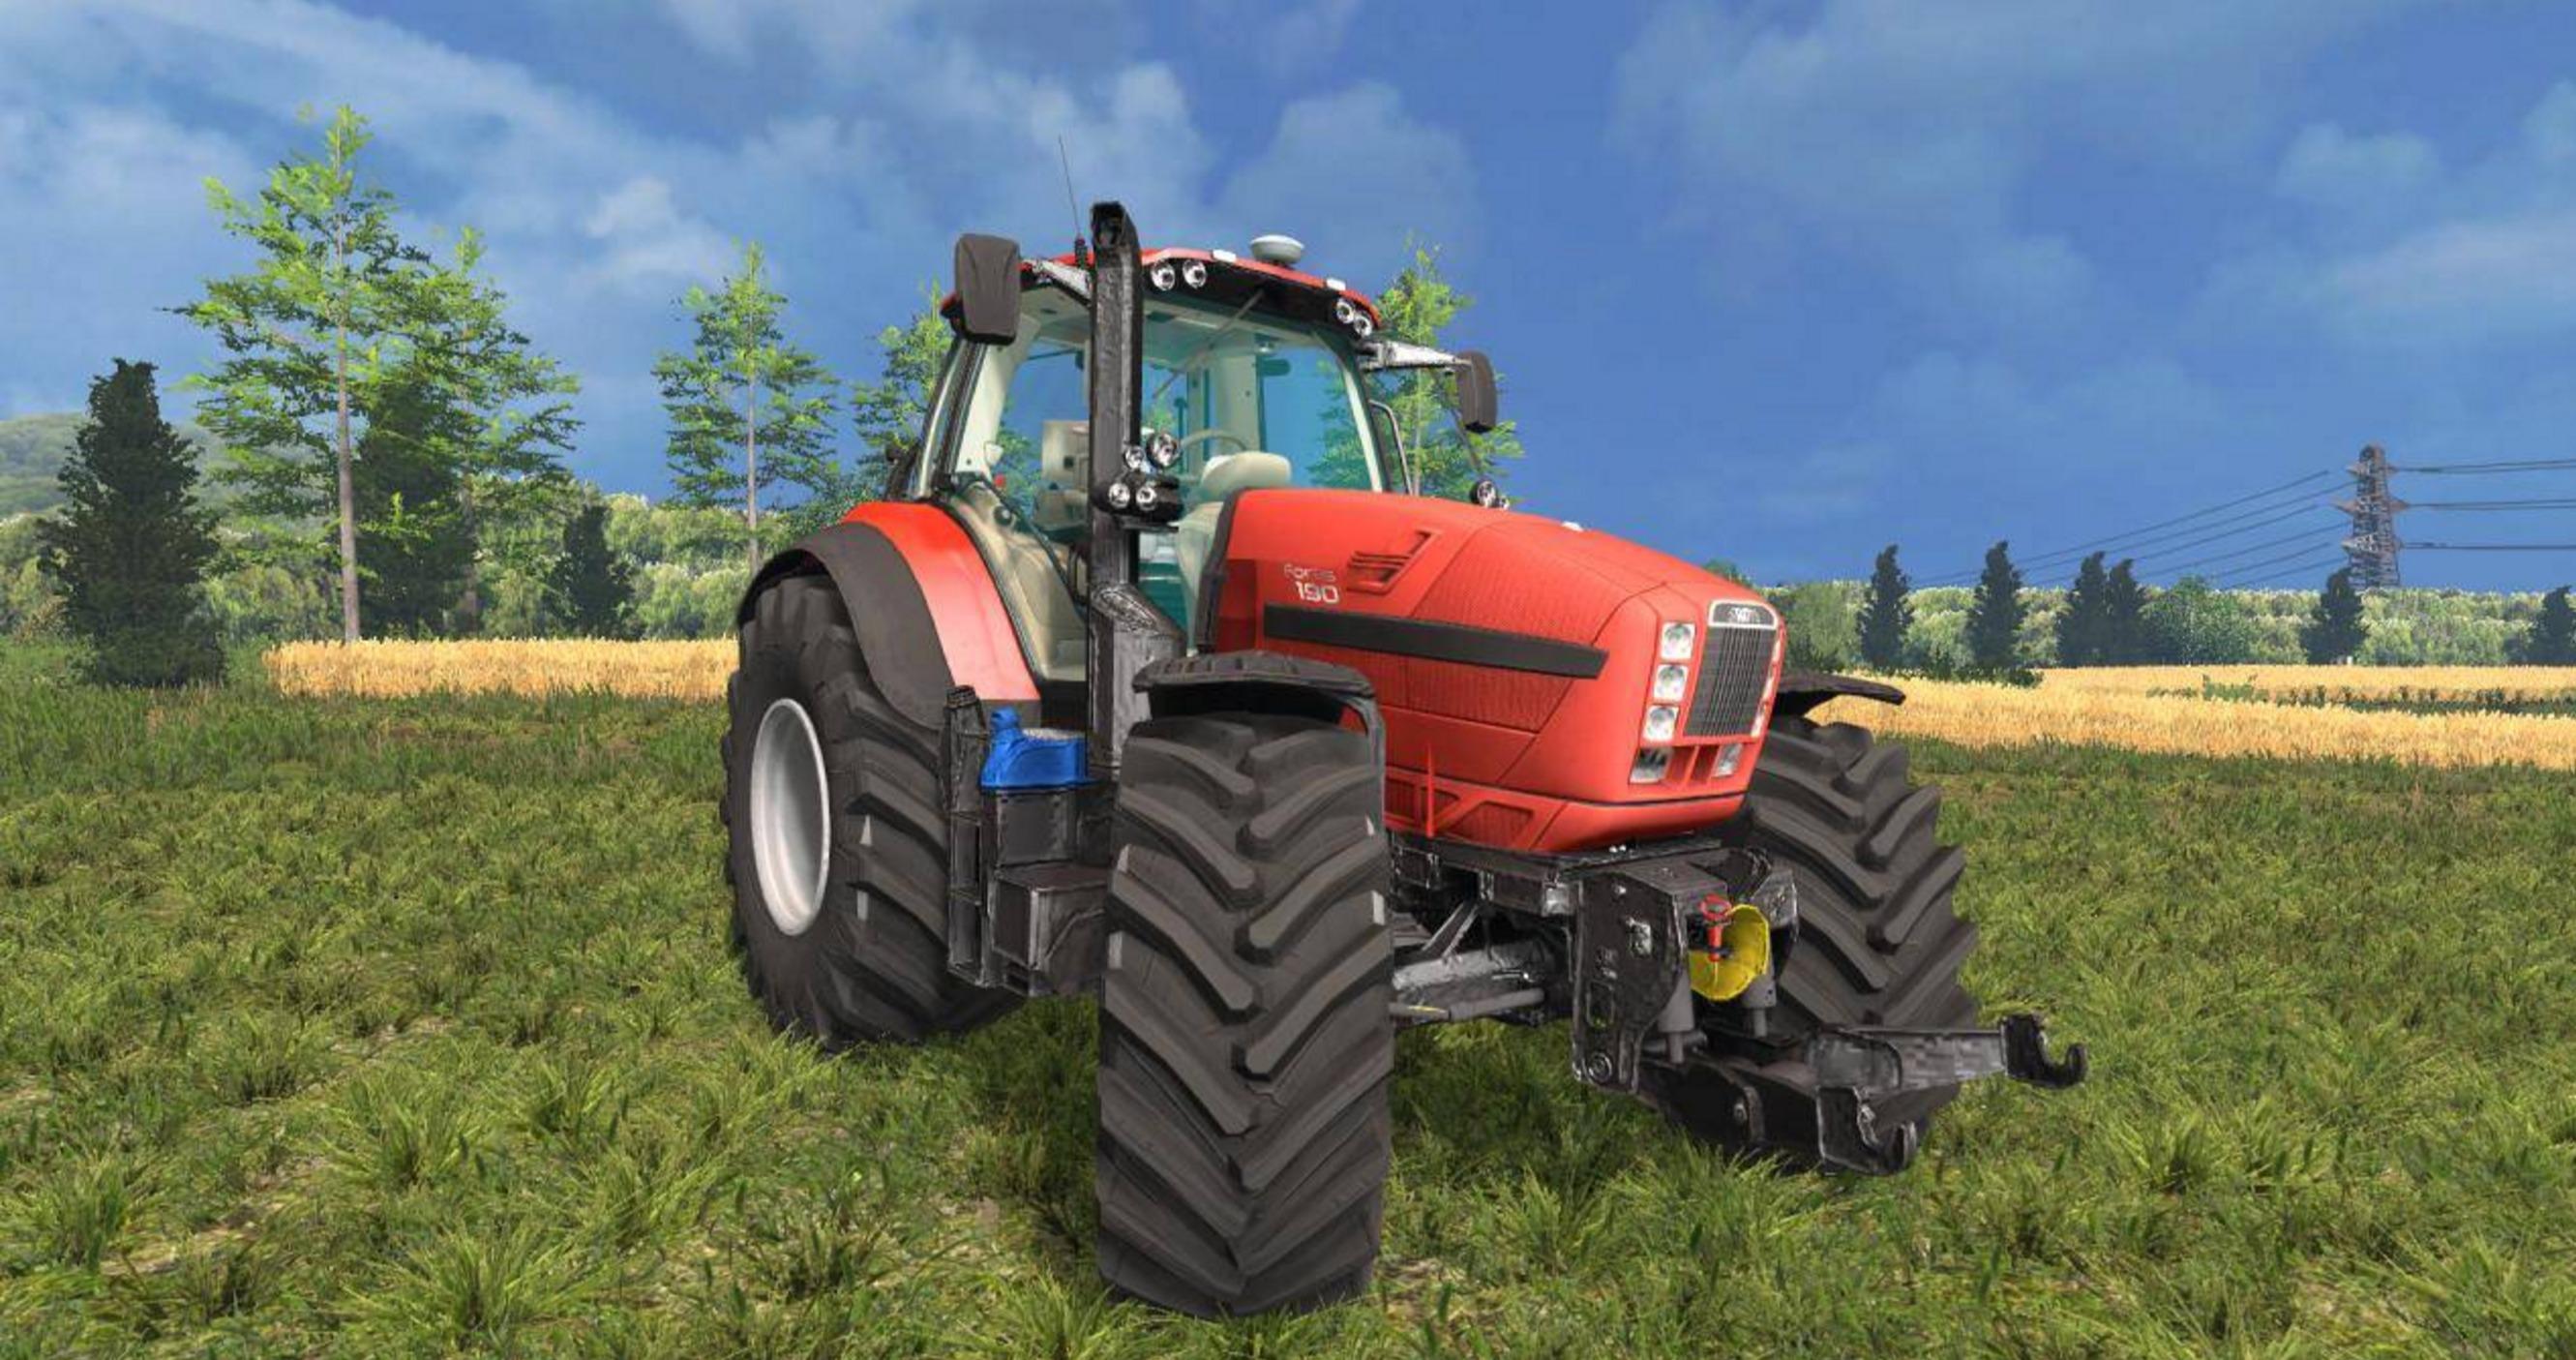 ... Fortis 190 Tractor - Farming simulator 2017 / 2015   15 / 17 LS mod: www.farming2015mods.com/farming-simulator-2015/tractors/same-fortis...